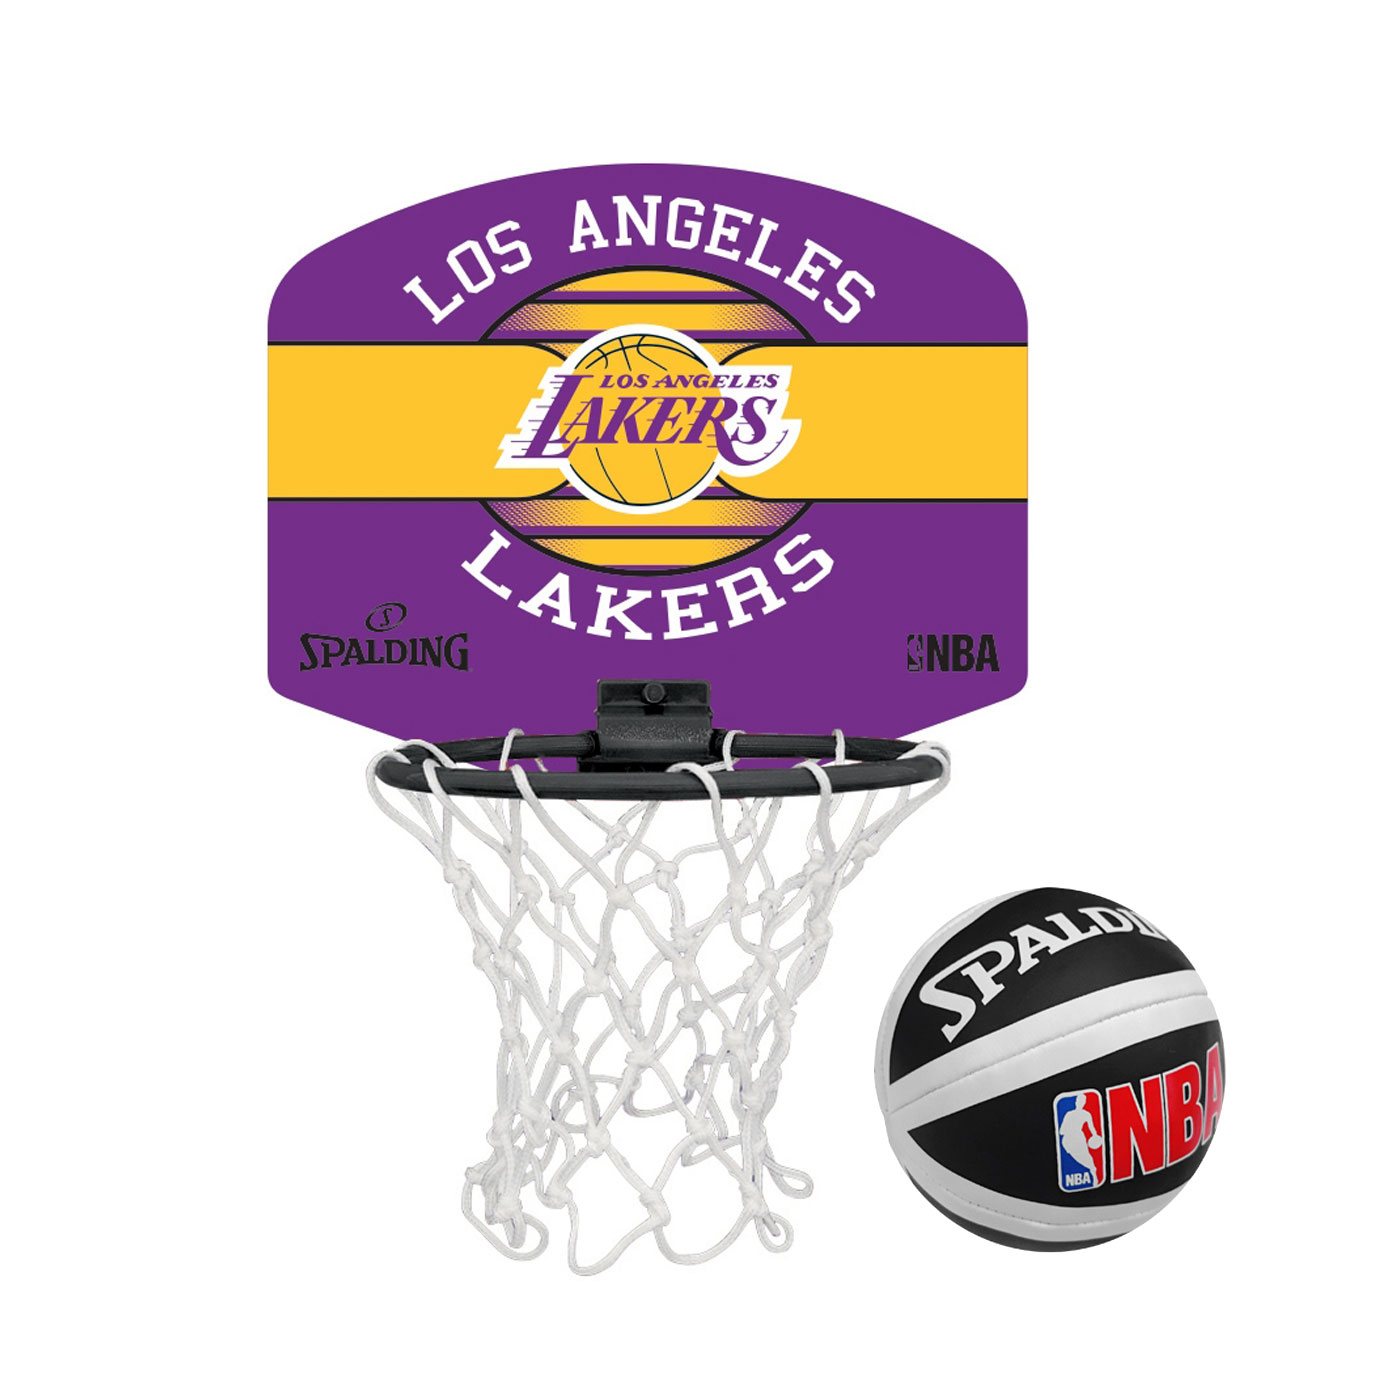 SPALDING 18'小籃板-湖人 SPA77656 - 紫黃